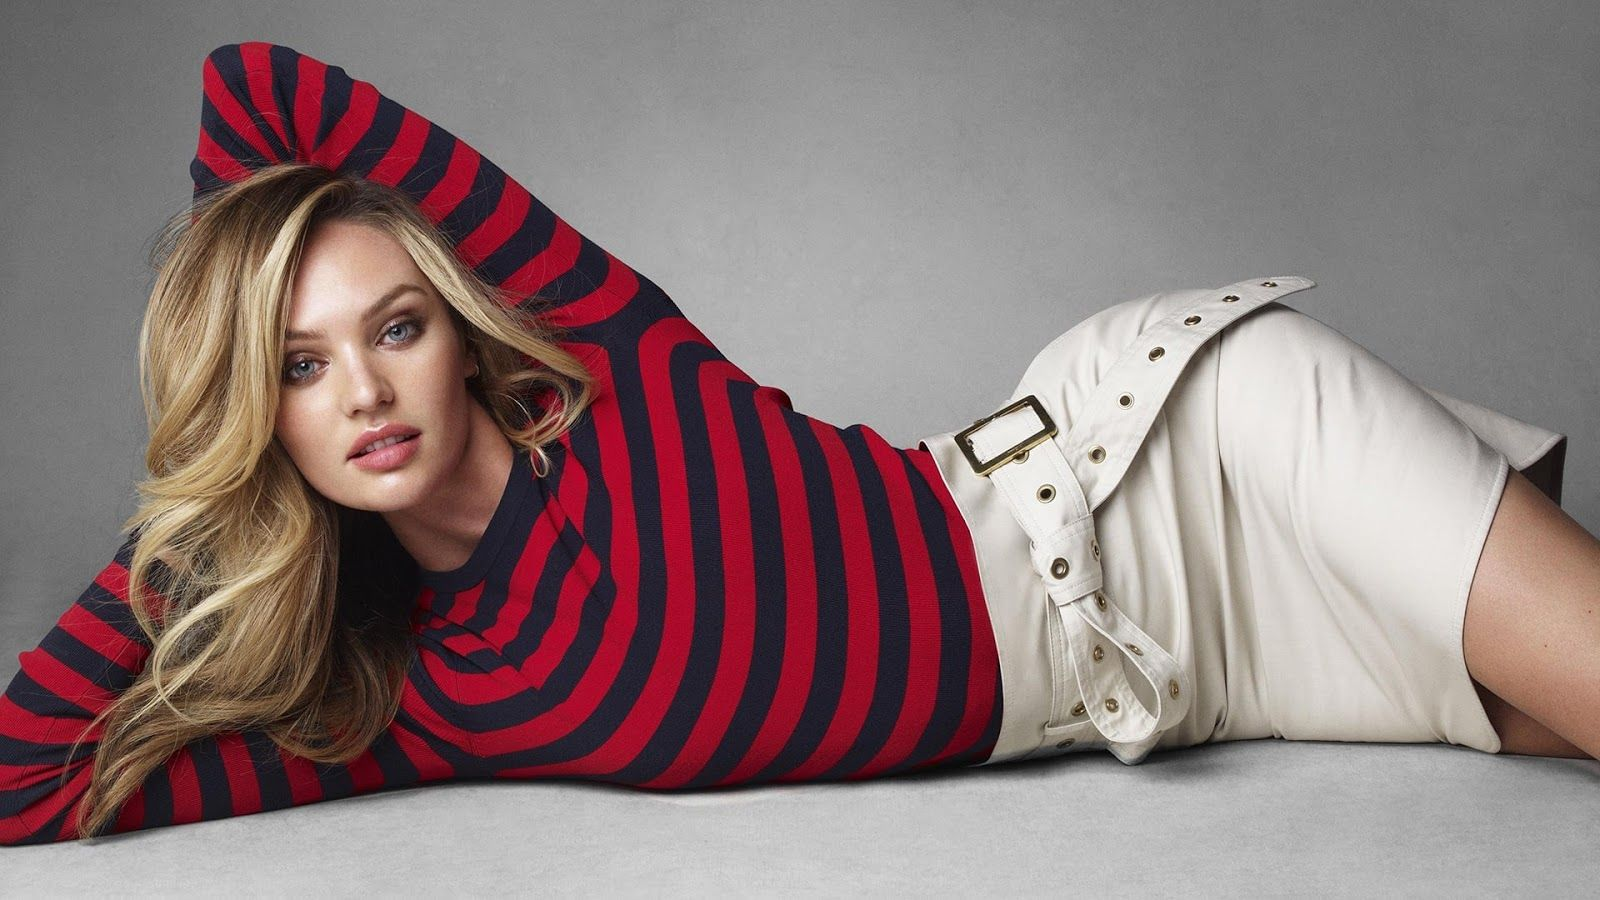 Hollywood News Candice Swanepoel Wallpaper Hd Wallpaper